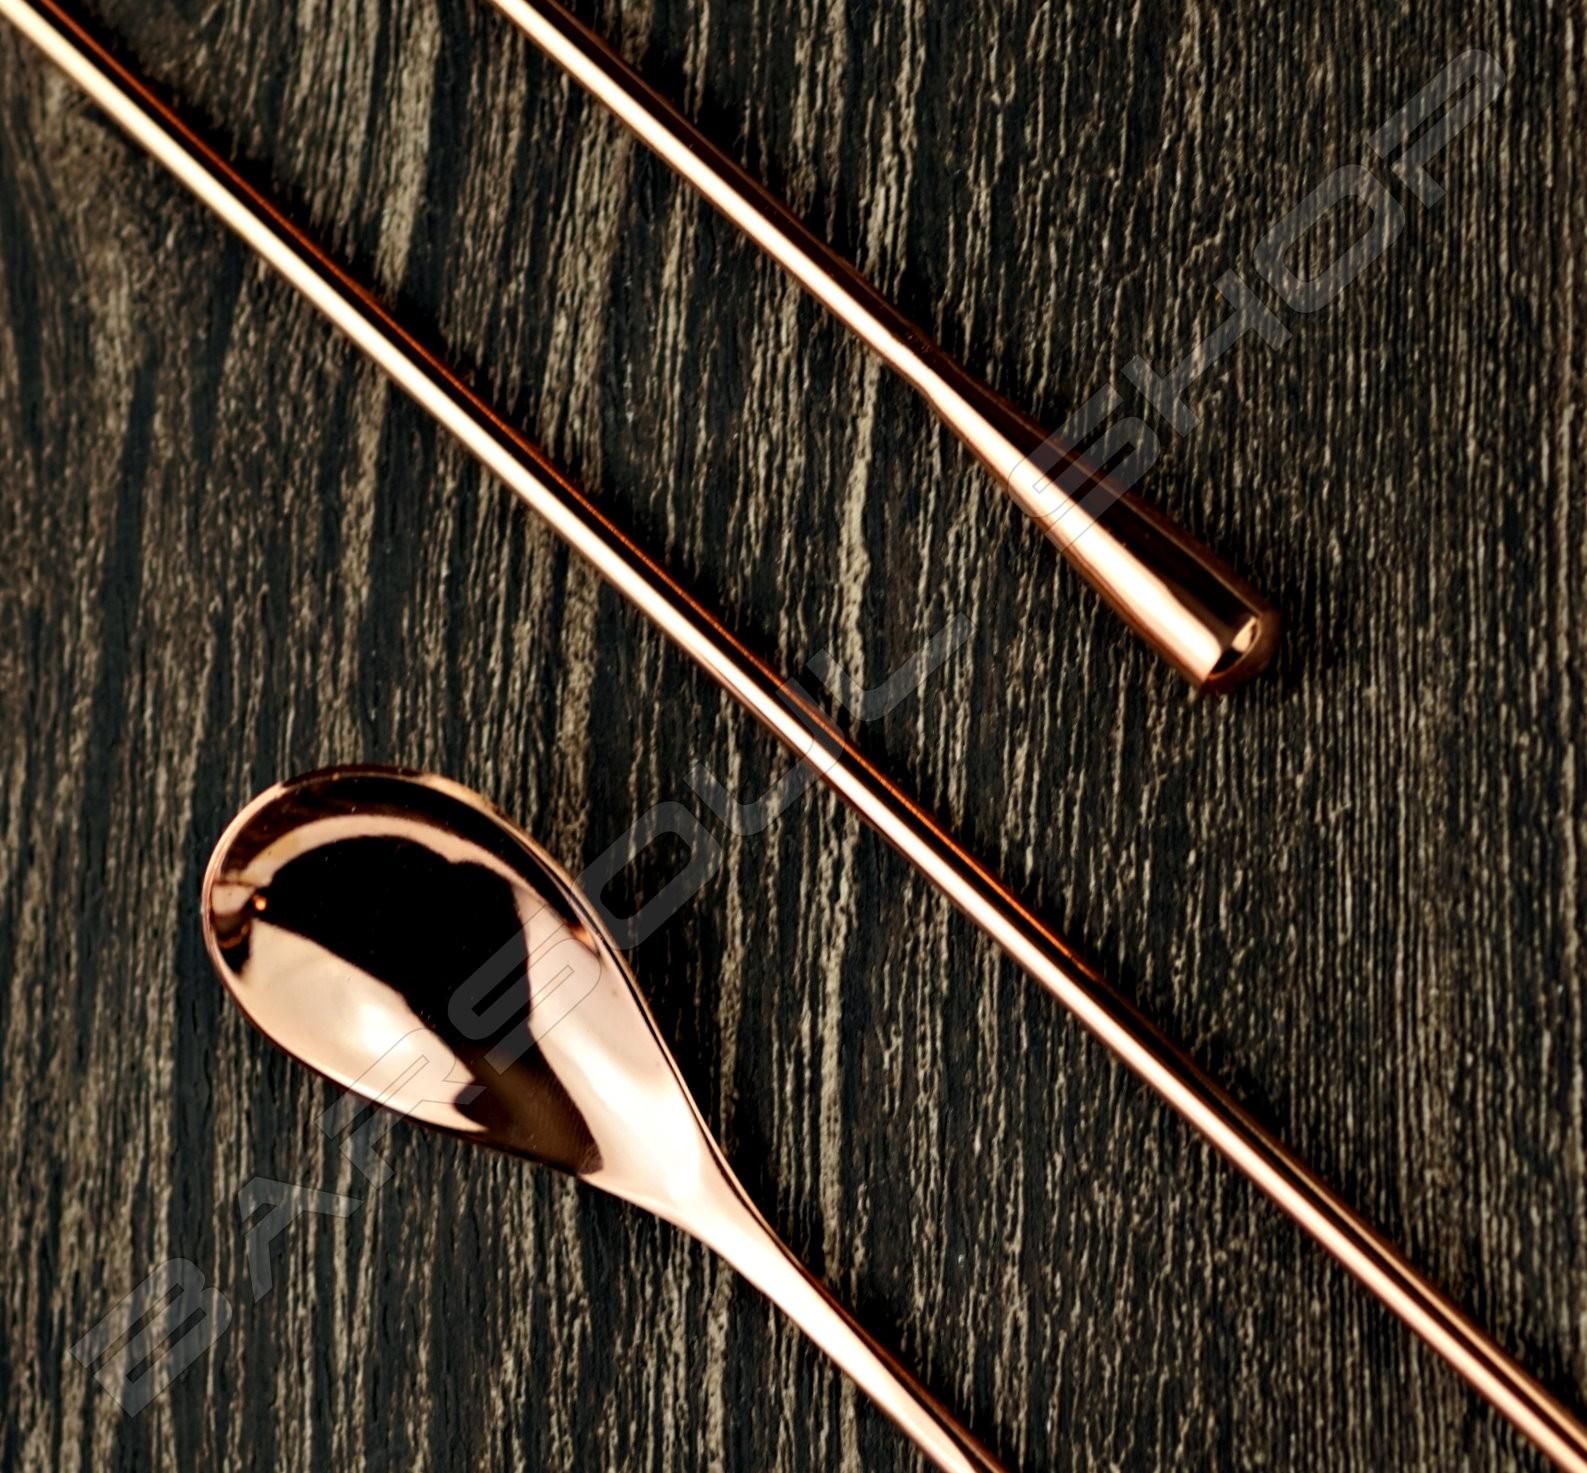 40cm 圓頭圓身吧叉匙(玫瑰金) Special Smooth body barspoon(rose gold)